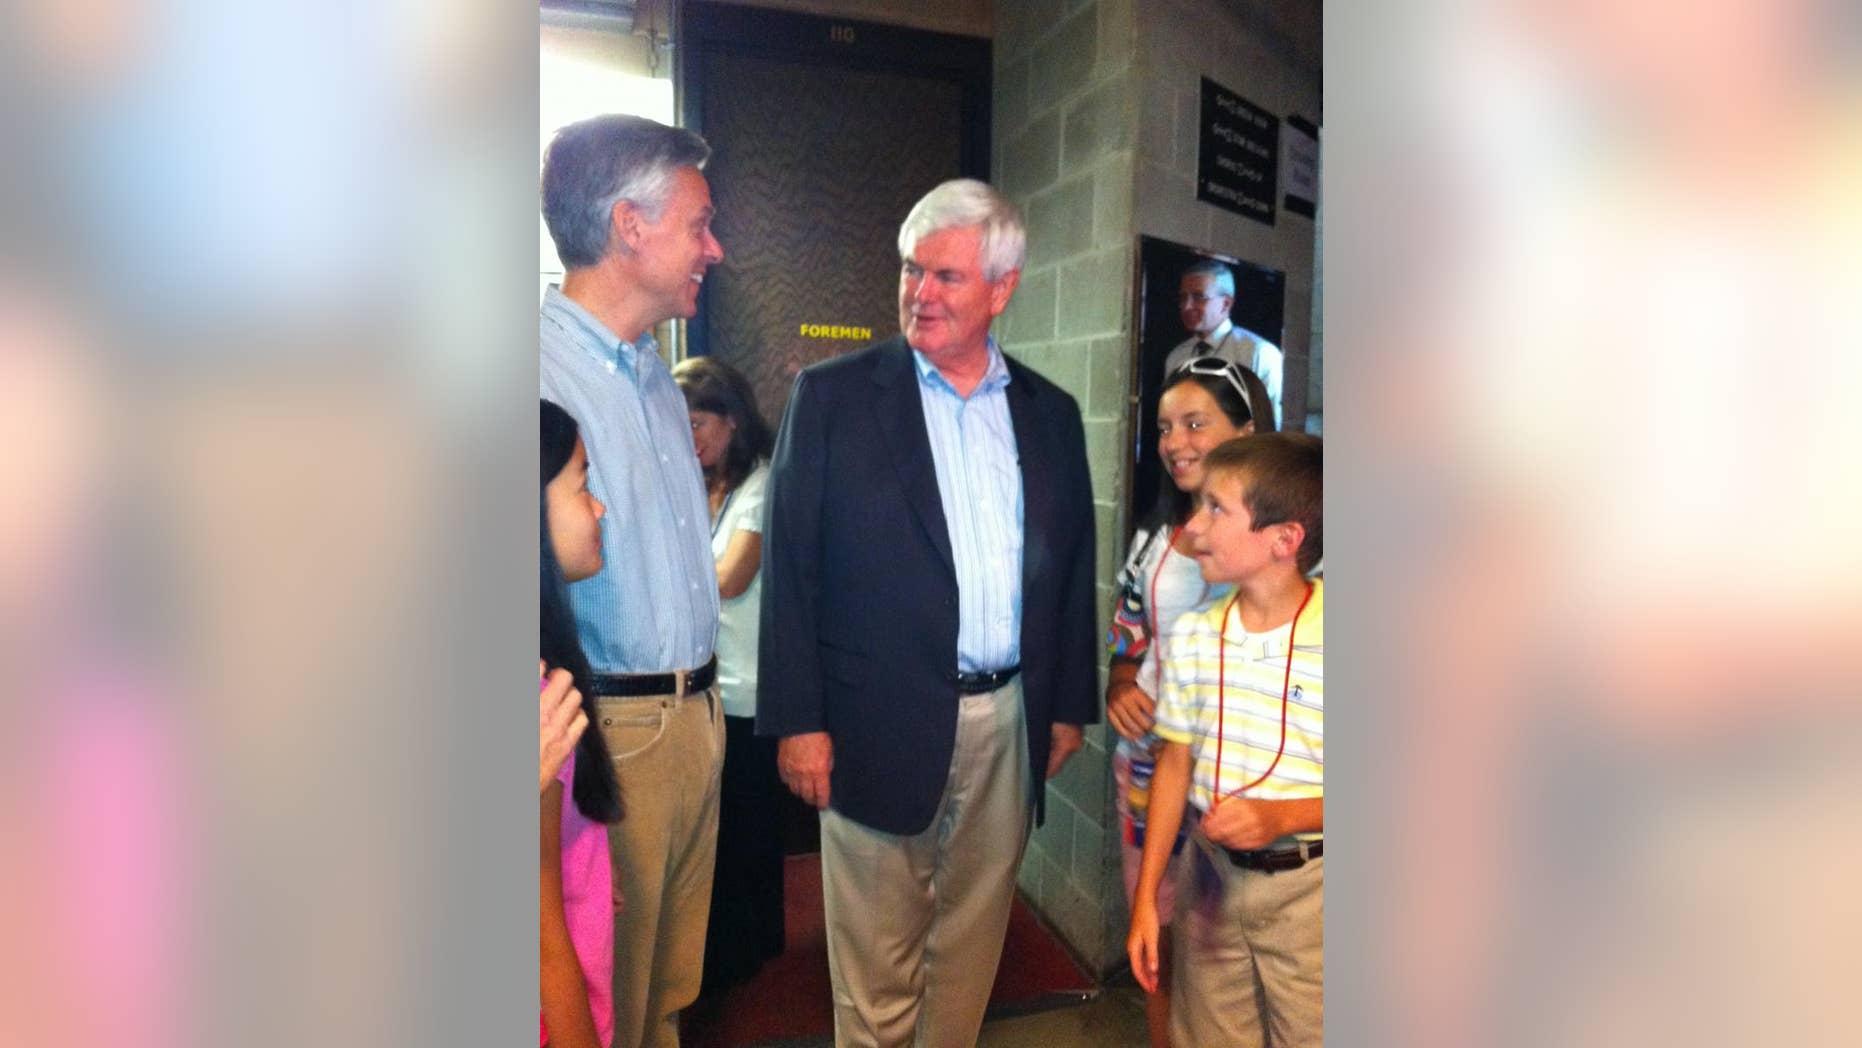 Jon Huntsman and Newt Gingrich Aug 11 (FOX News)